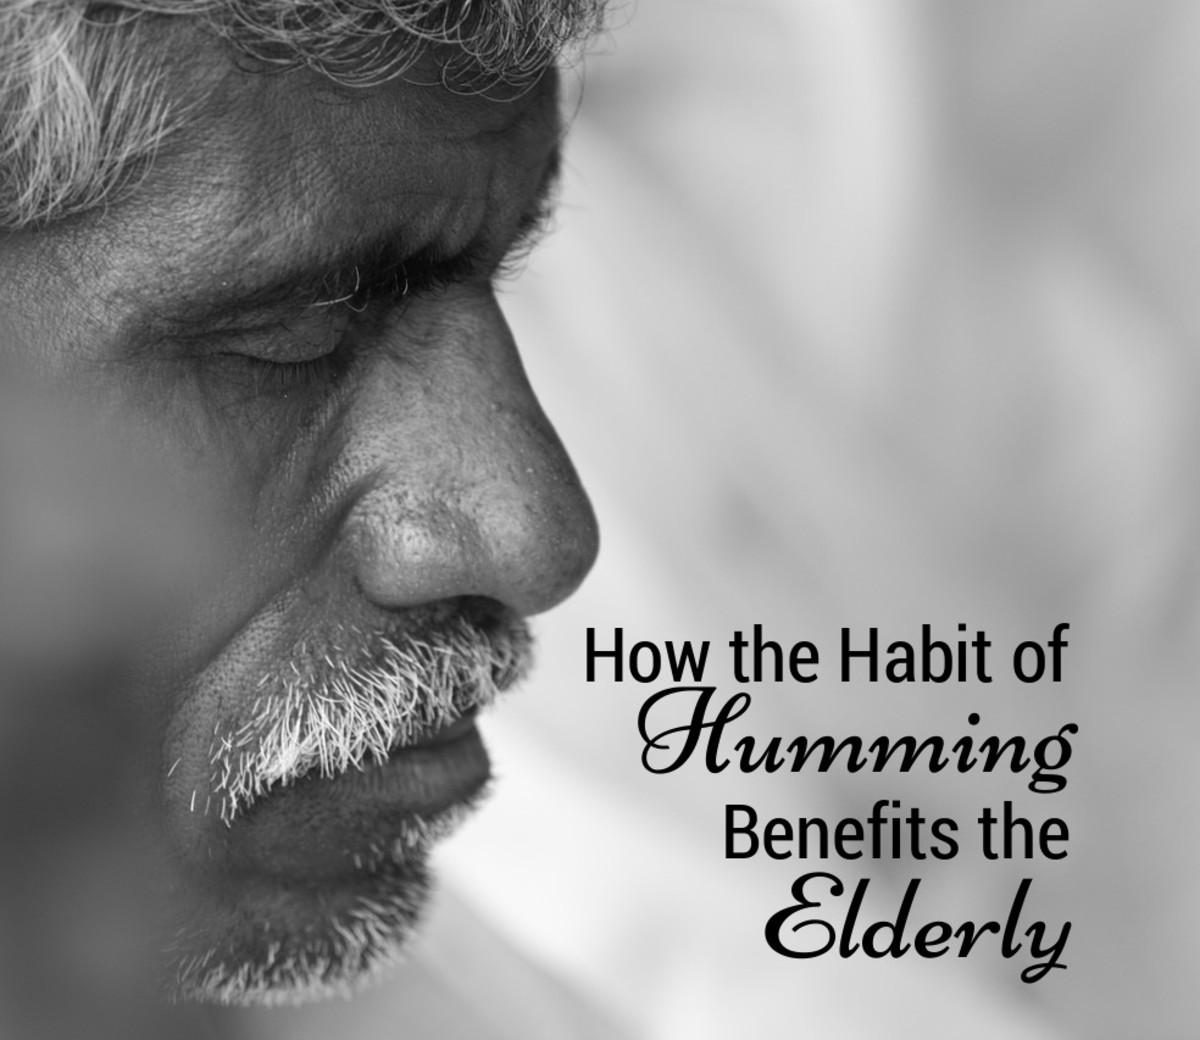 How the Habit of Humming Benefits the Elderly